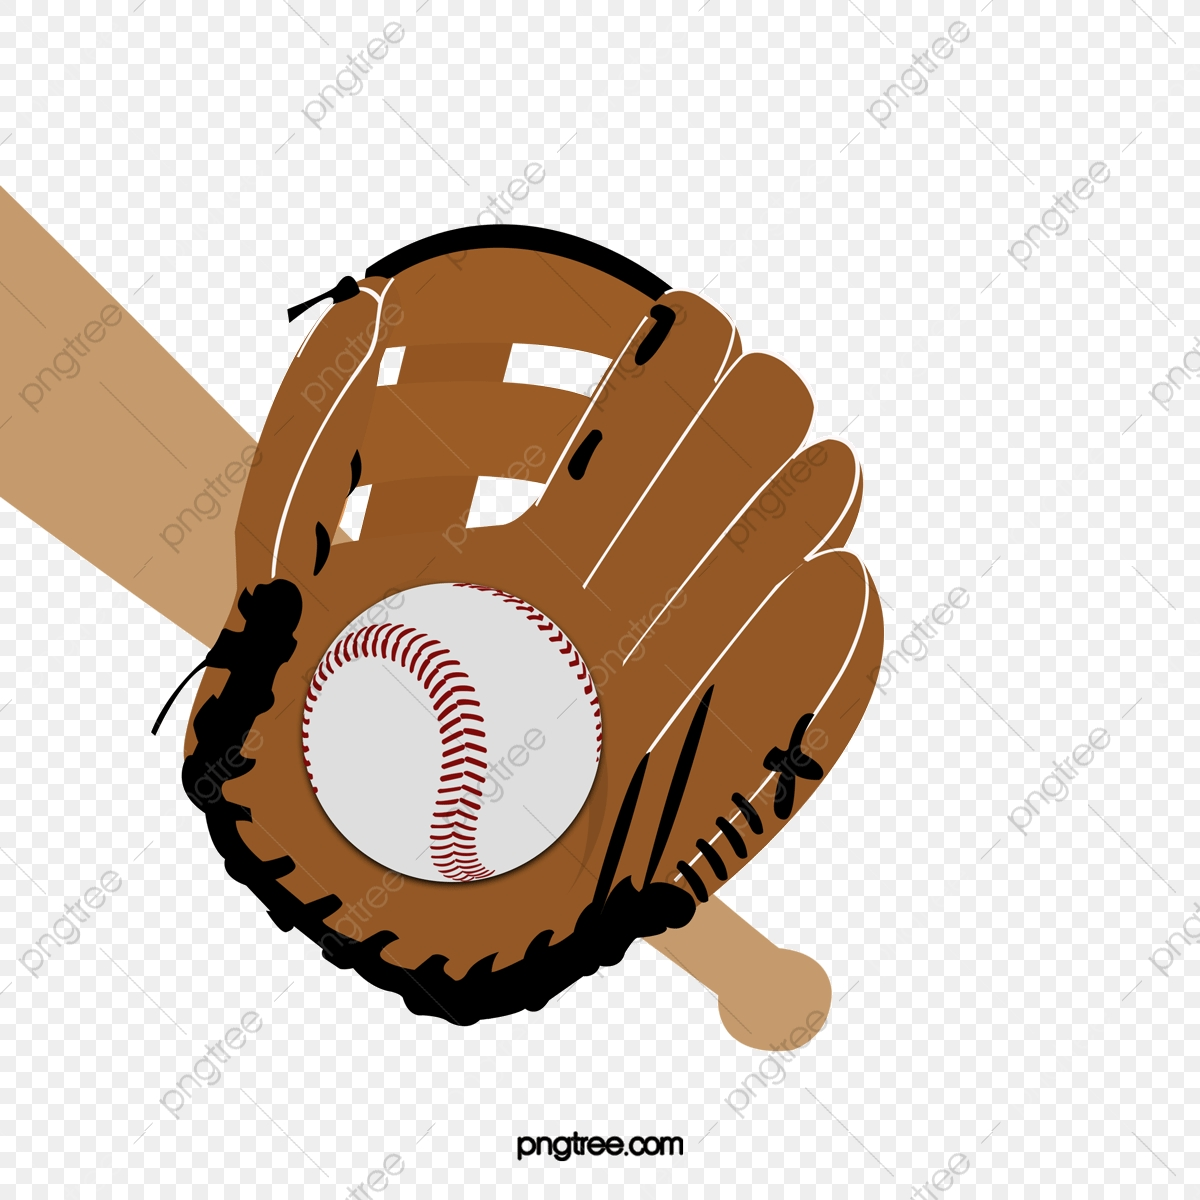 Baseball Creative Three Piece, Baseball Clipart, Wooden Baseball Bat.